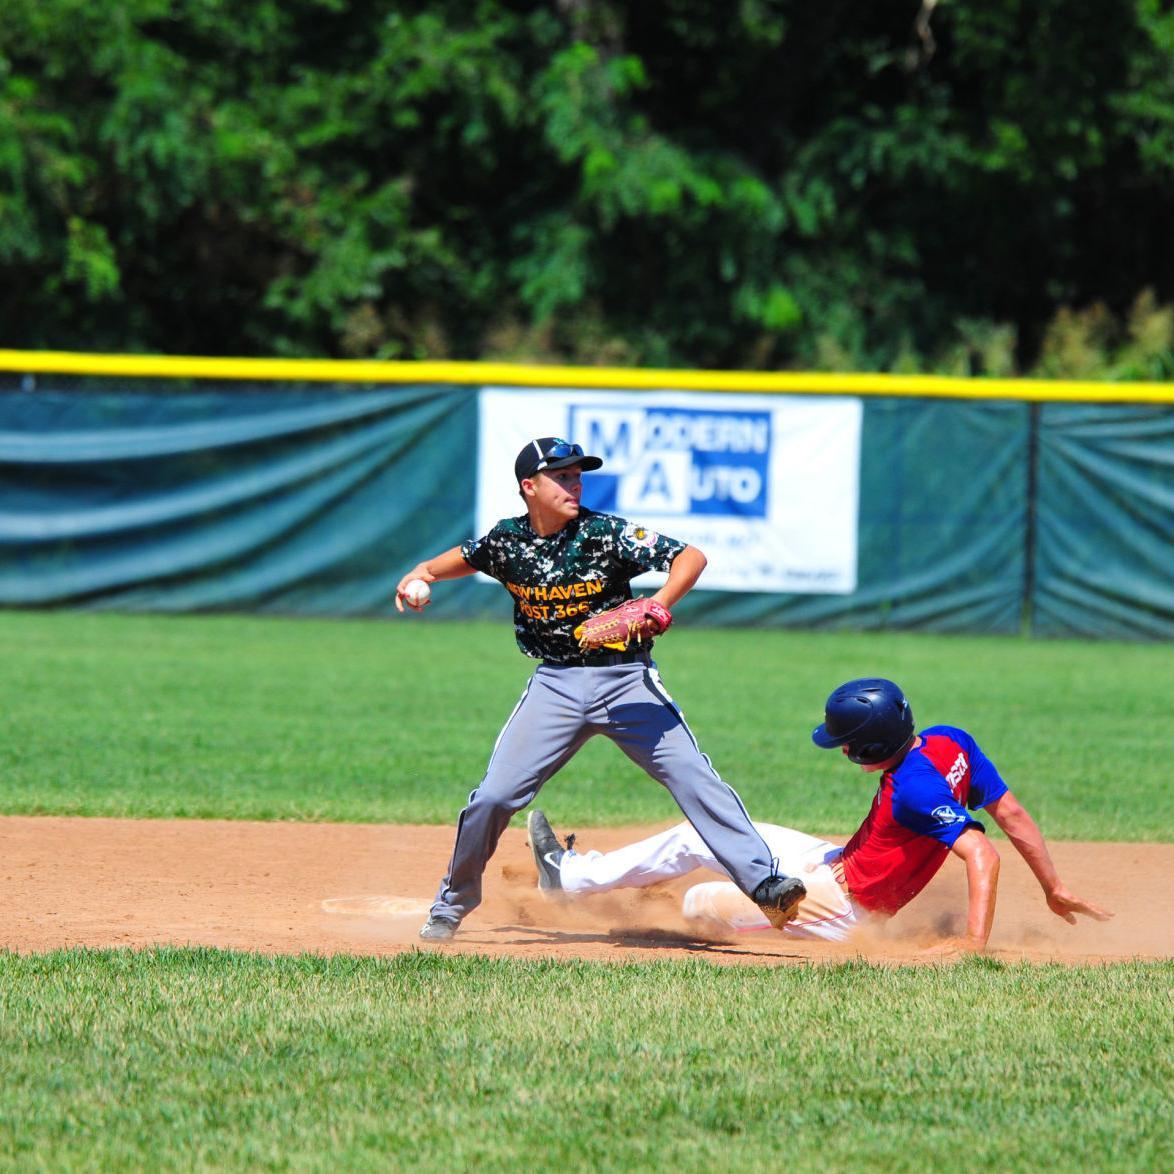 Junior Legion — Washington Post 218 vs. New Haven Post 366, Championship Series Game 1